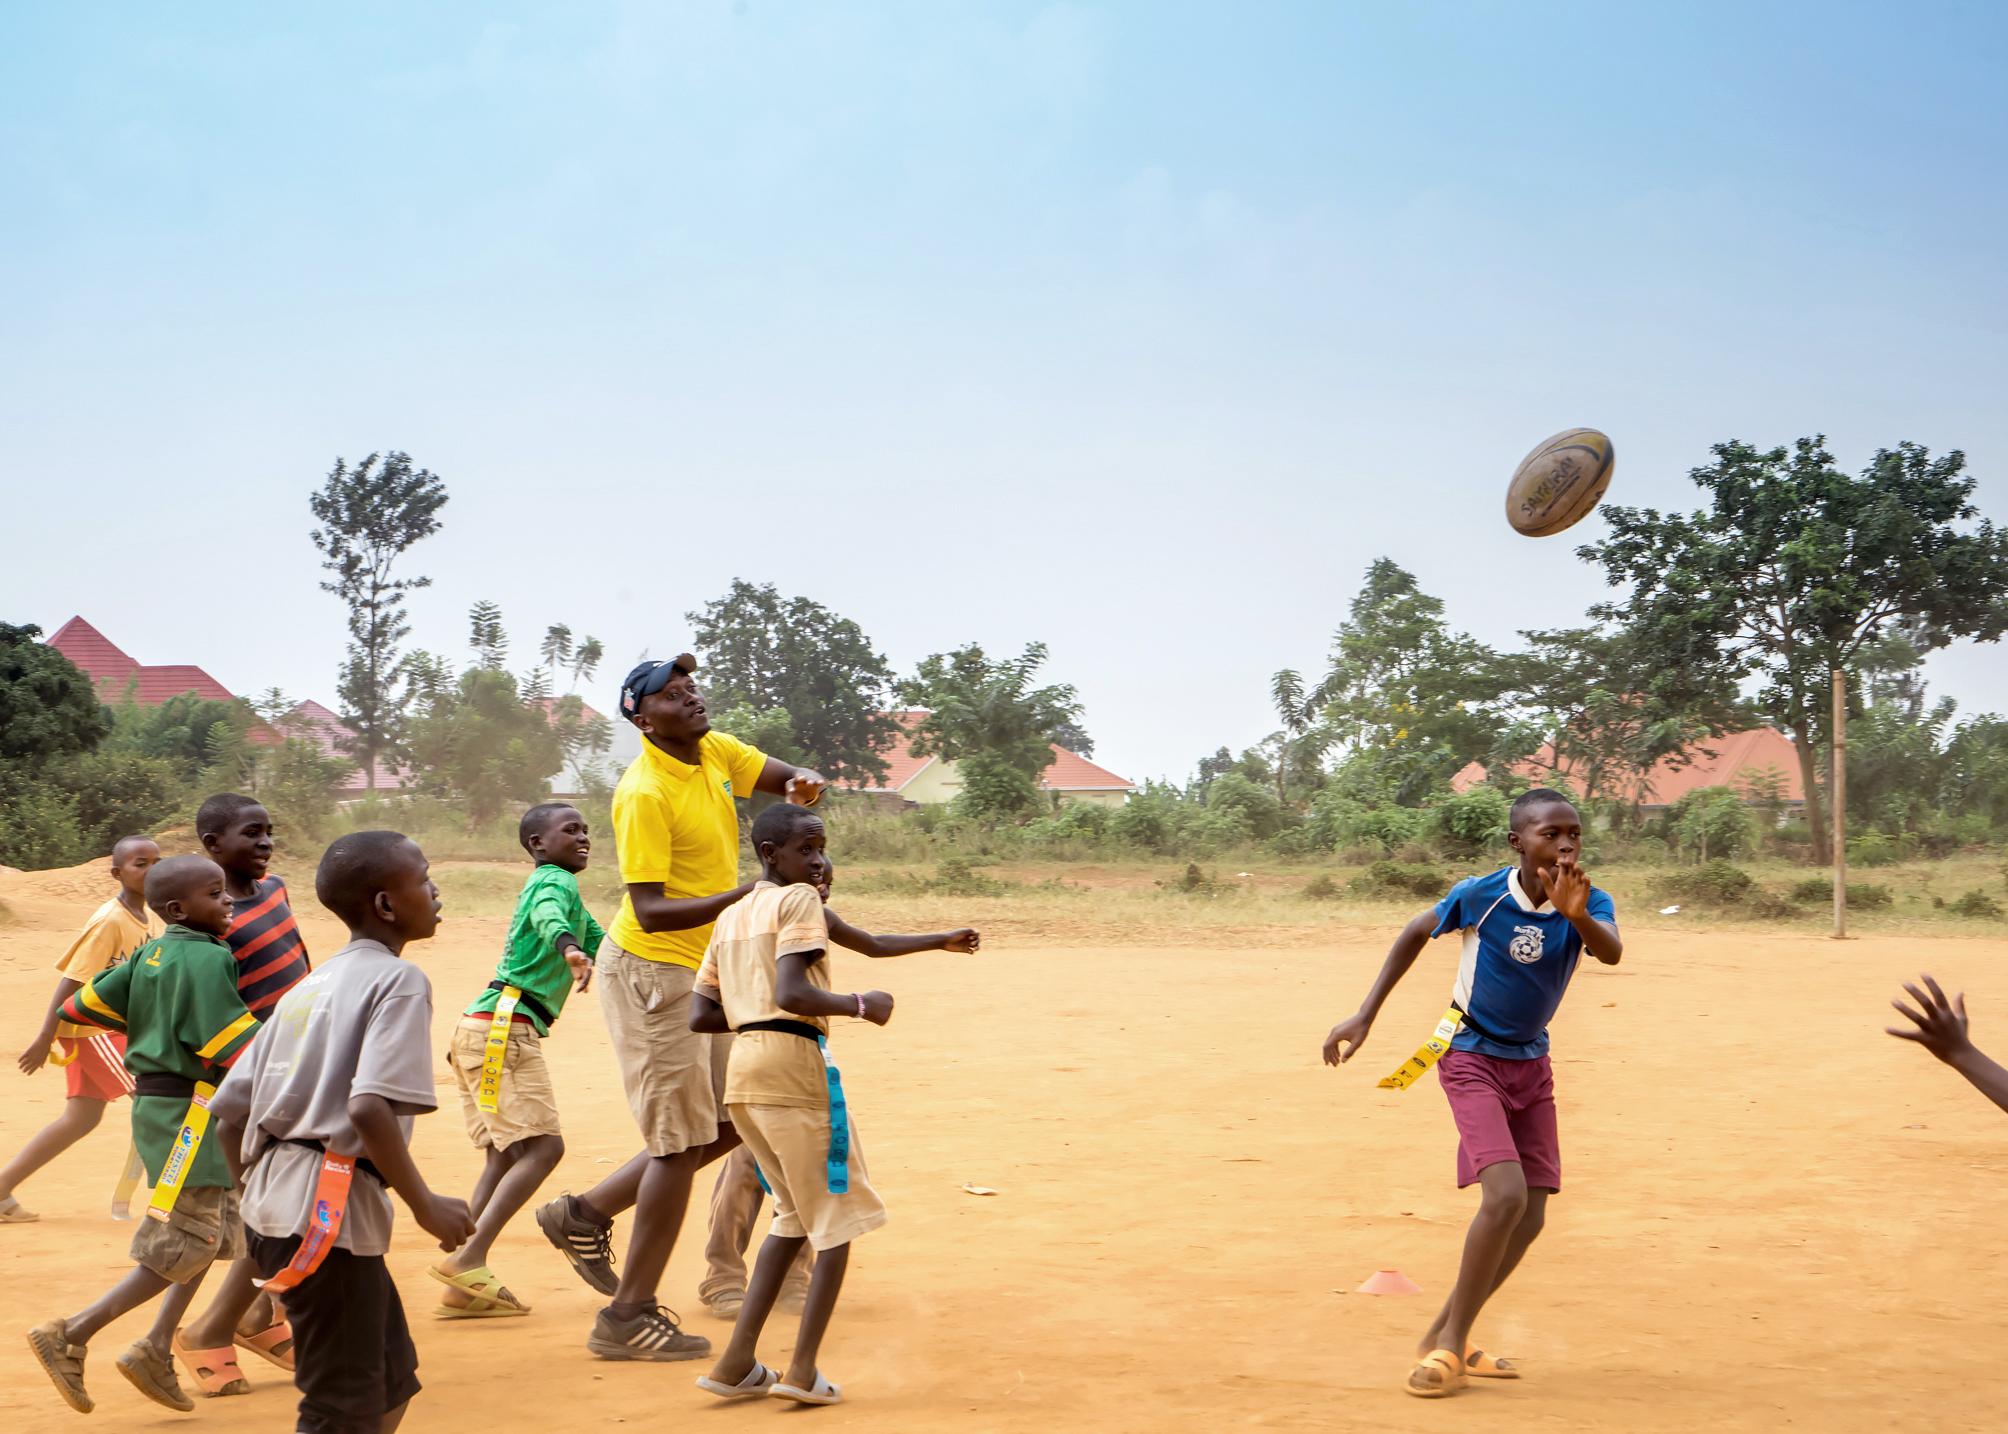 Coaching session, Rwandan Orphans Project, Kigali